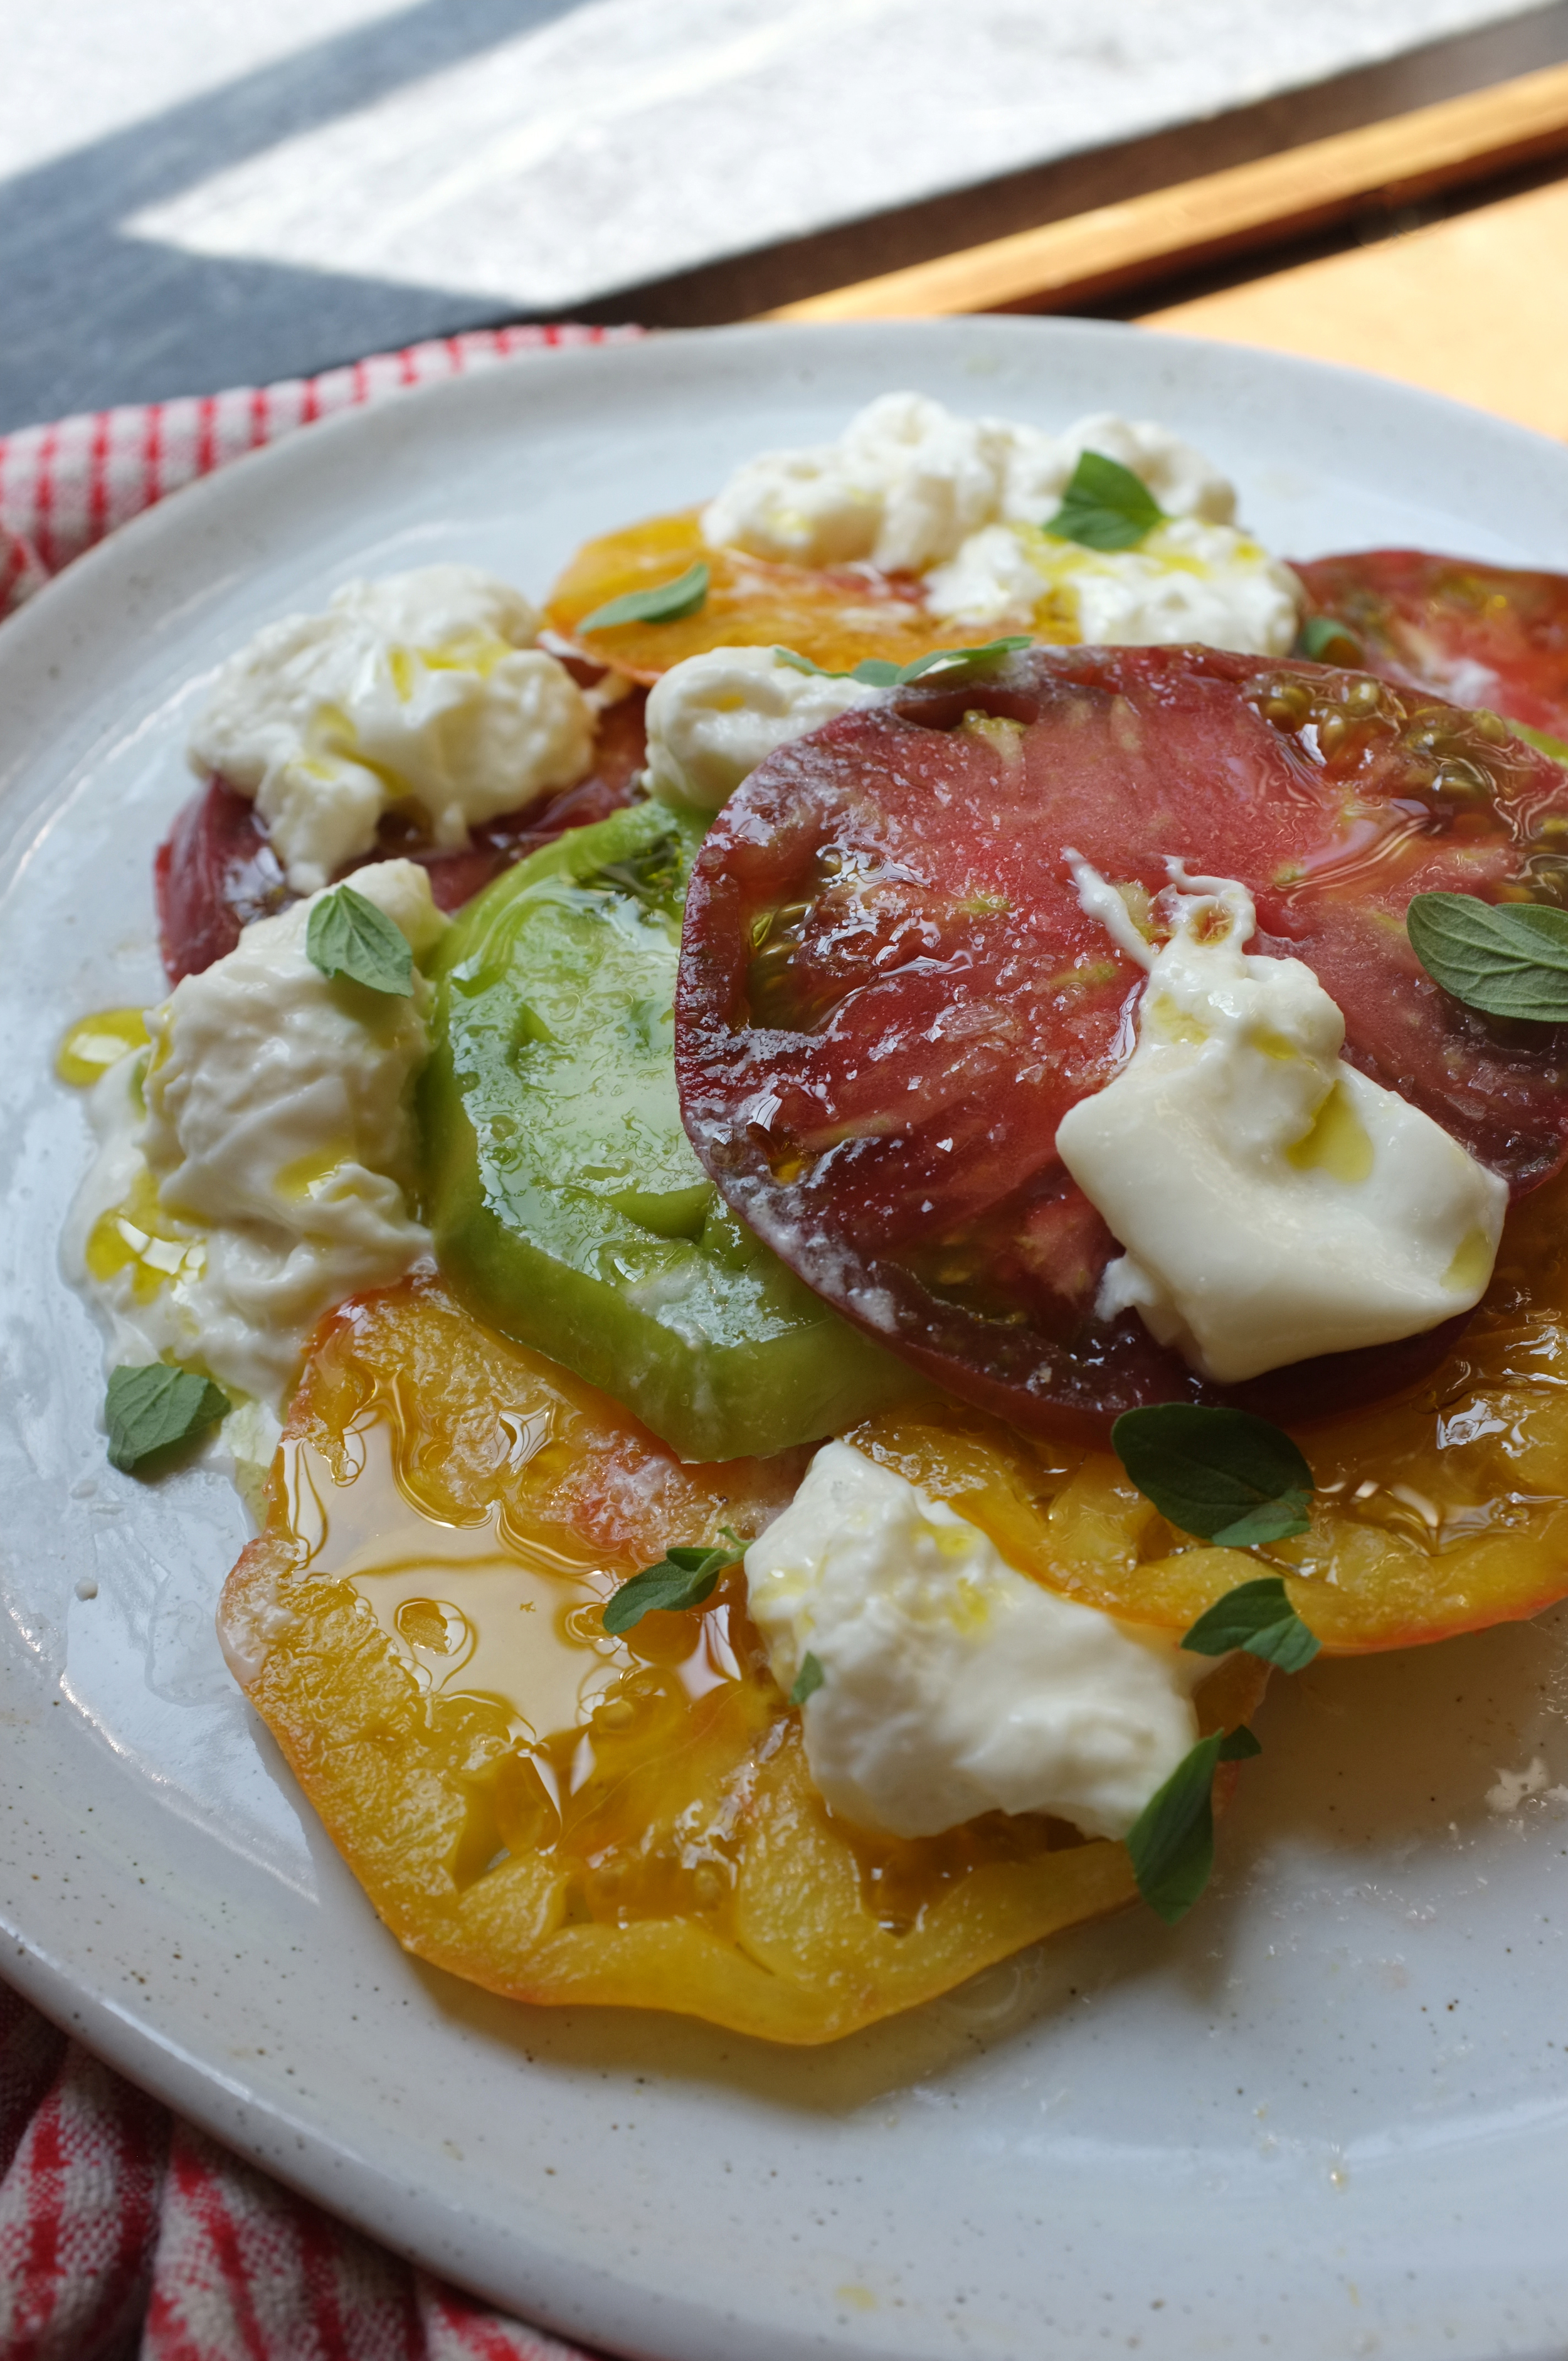 Fresh heirloom tomatoes with burrata, olive oil, oregano and Maldon salt.